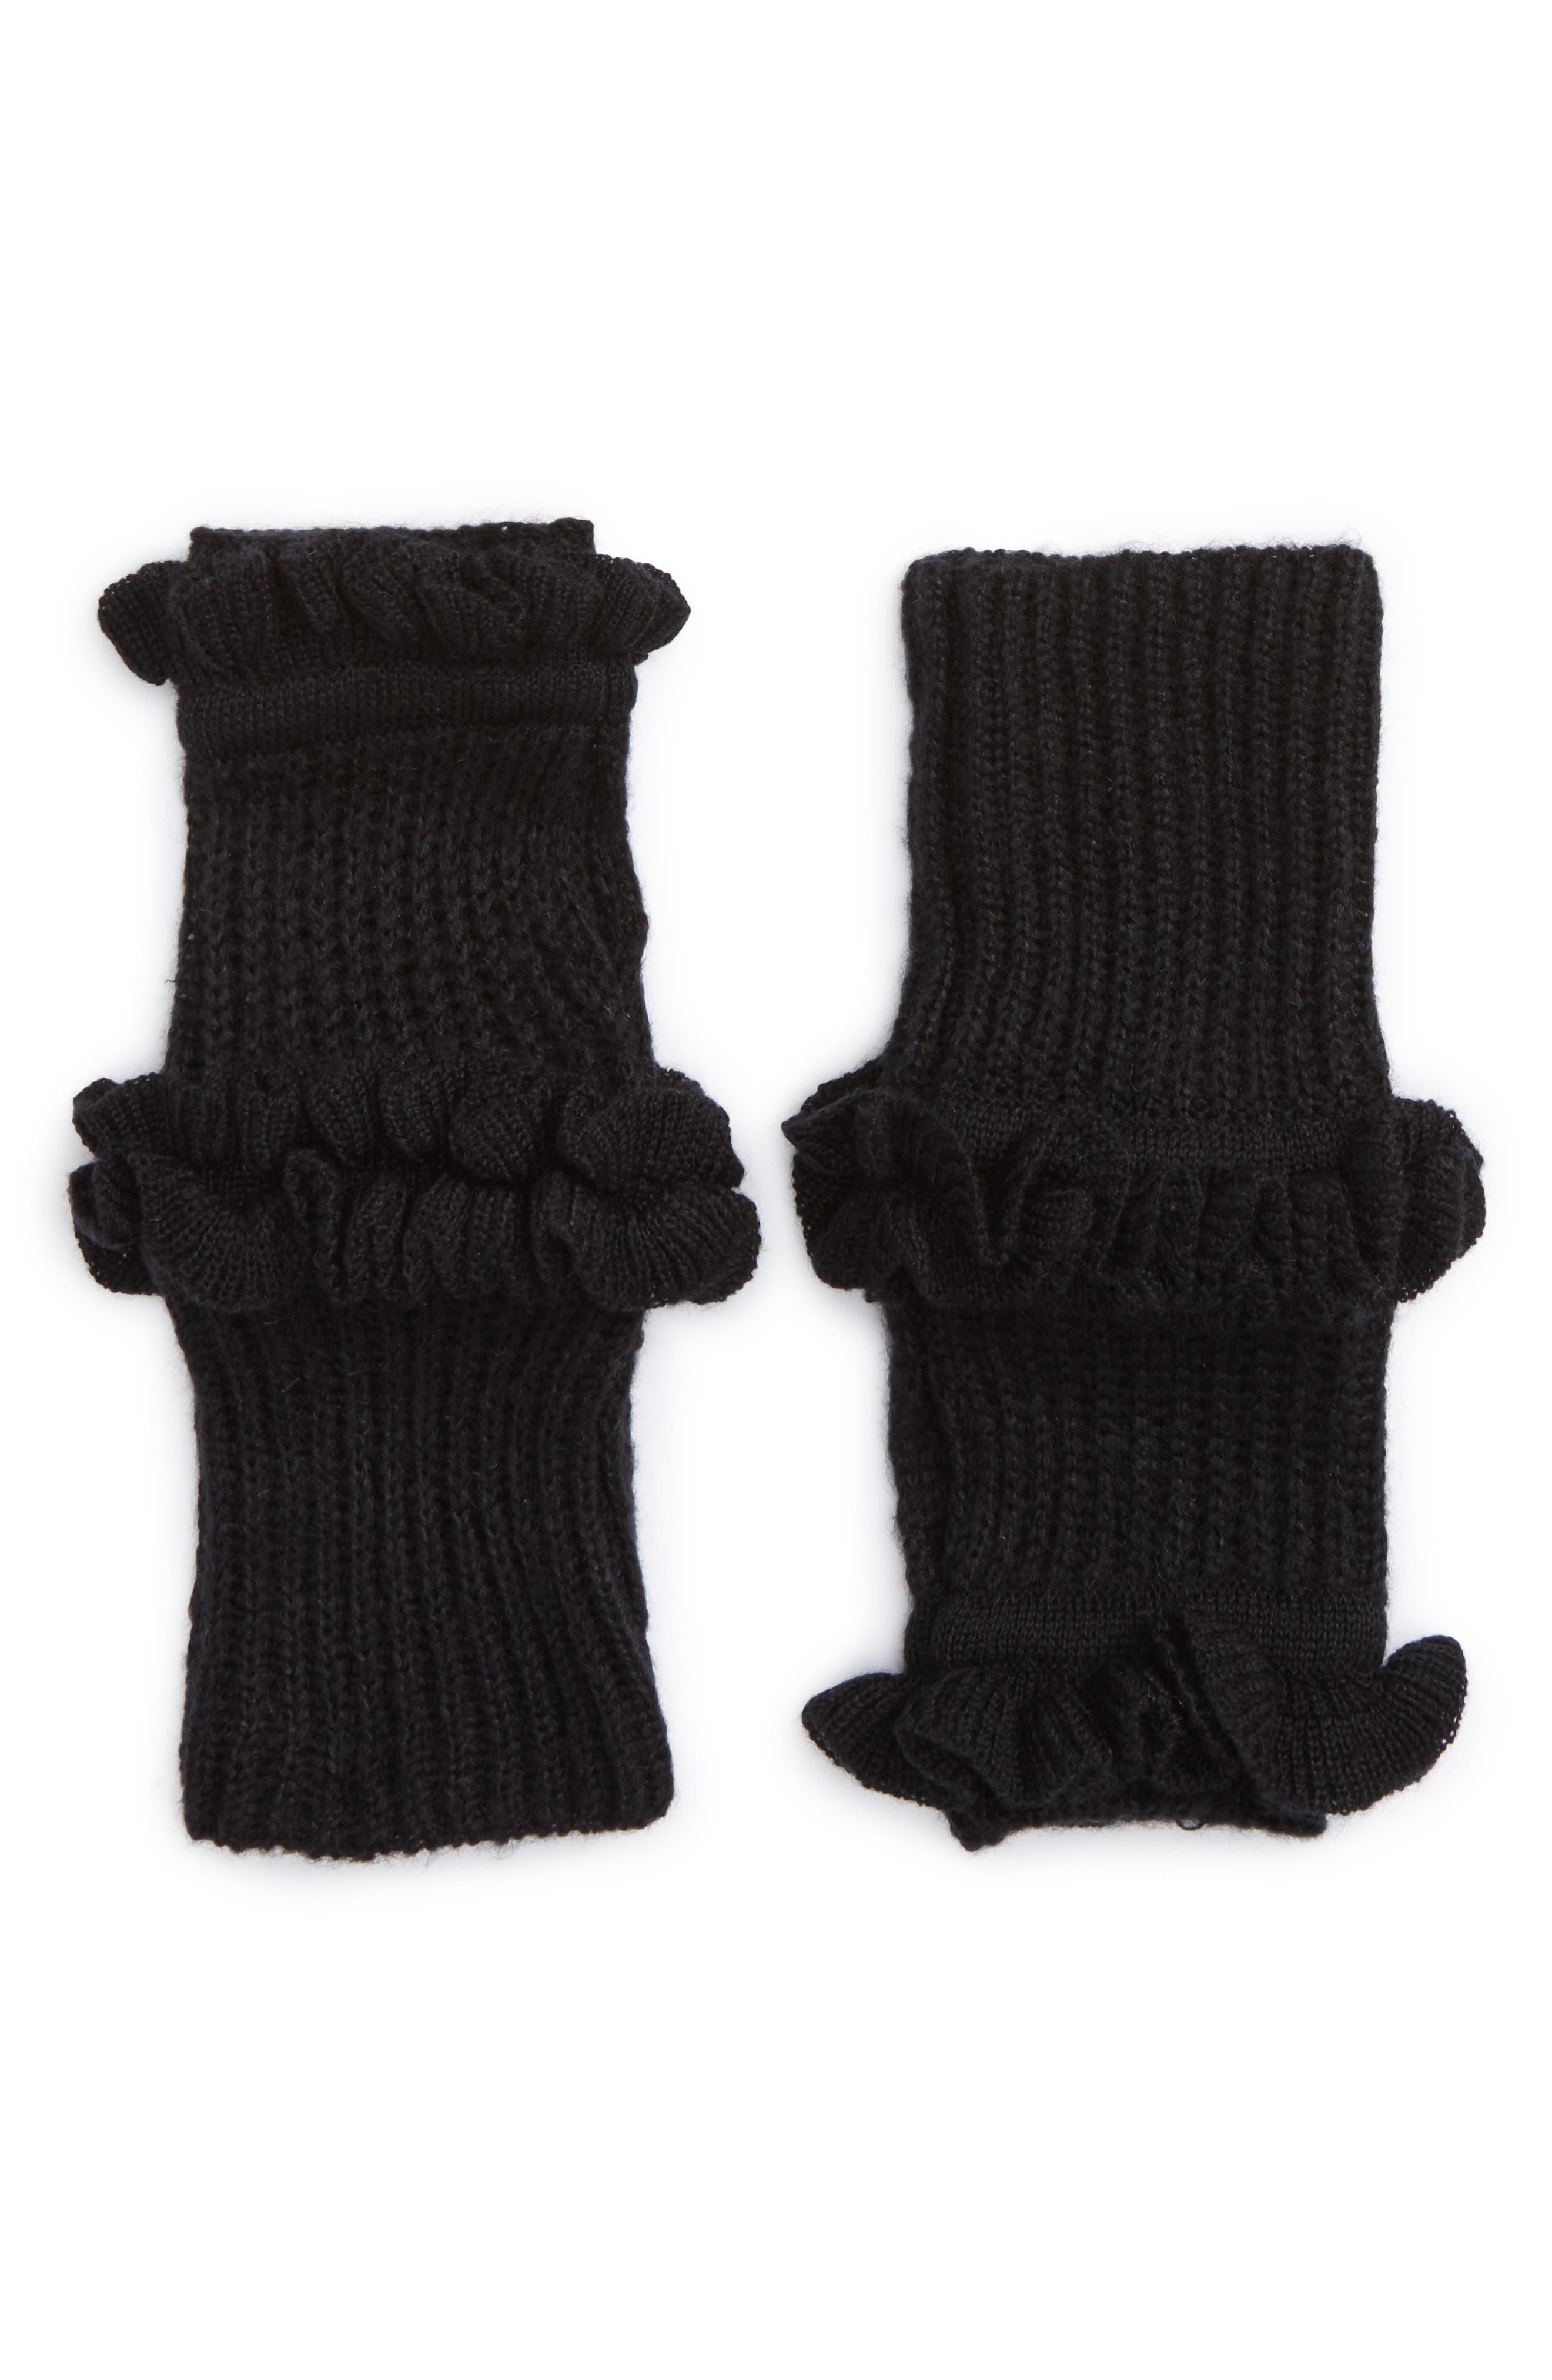 Ruffle Fingerless Gloves,                             Main thumbnail 1, color,                             001